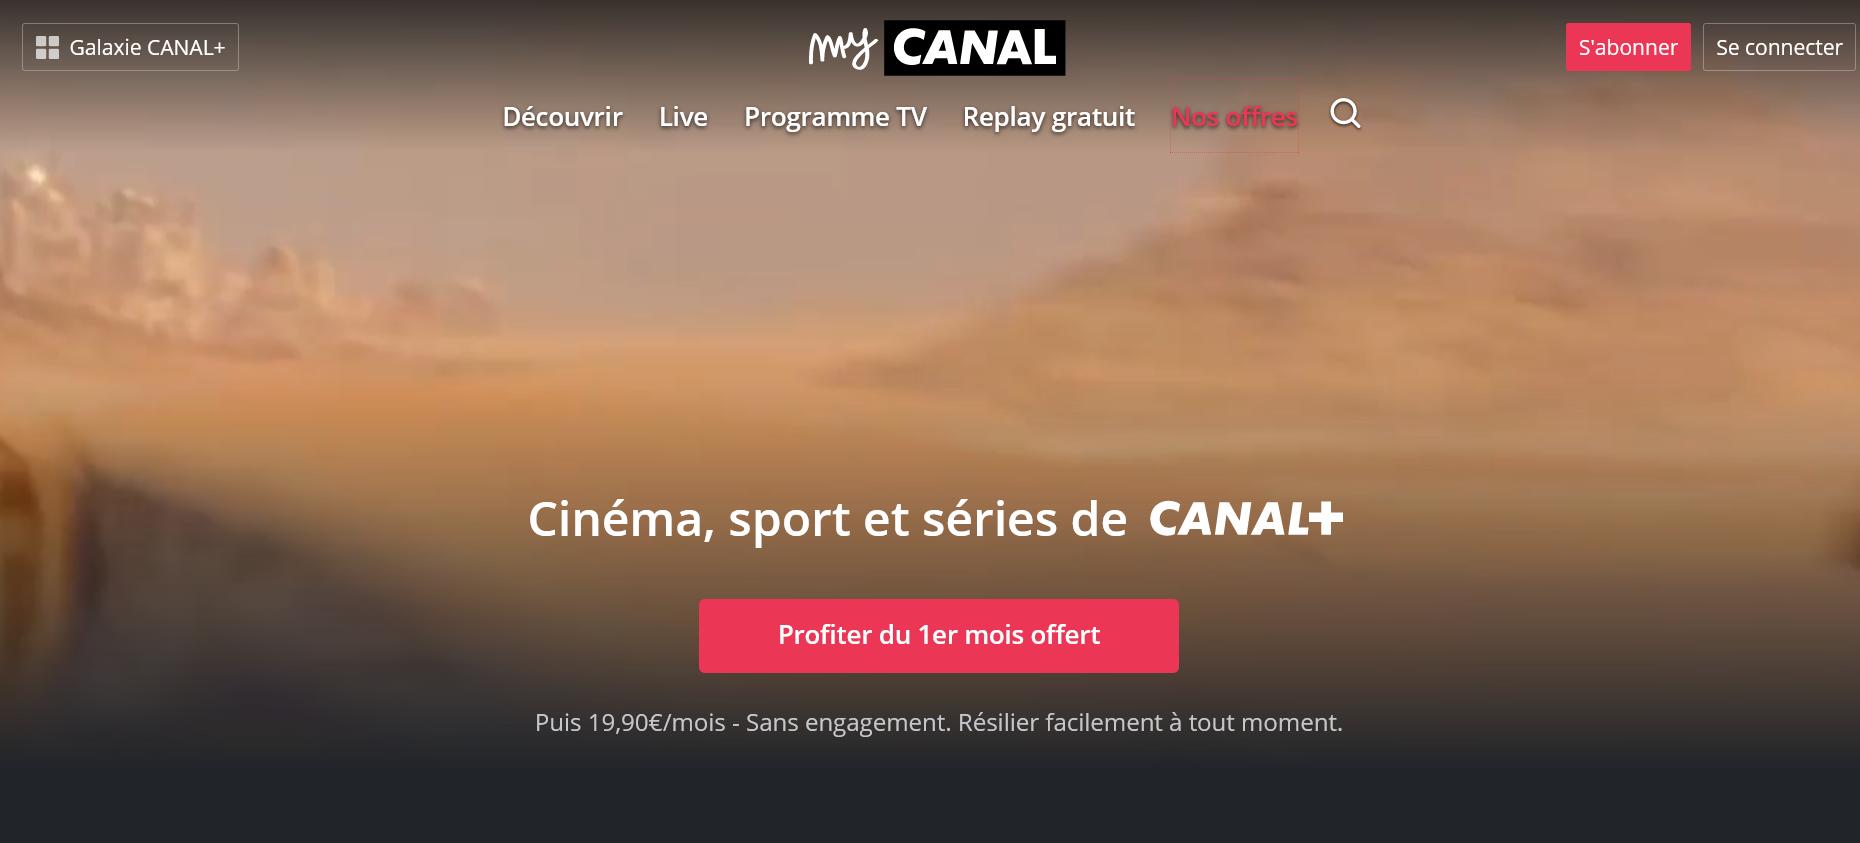 MyCanal - Smart TV - Télé connectée - Bbox